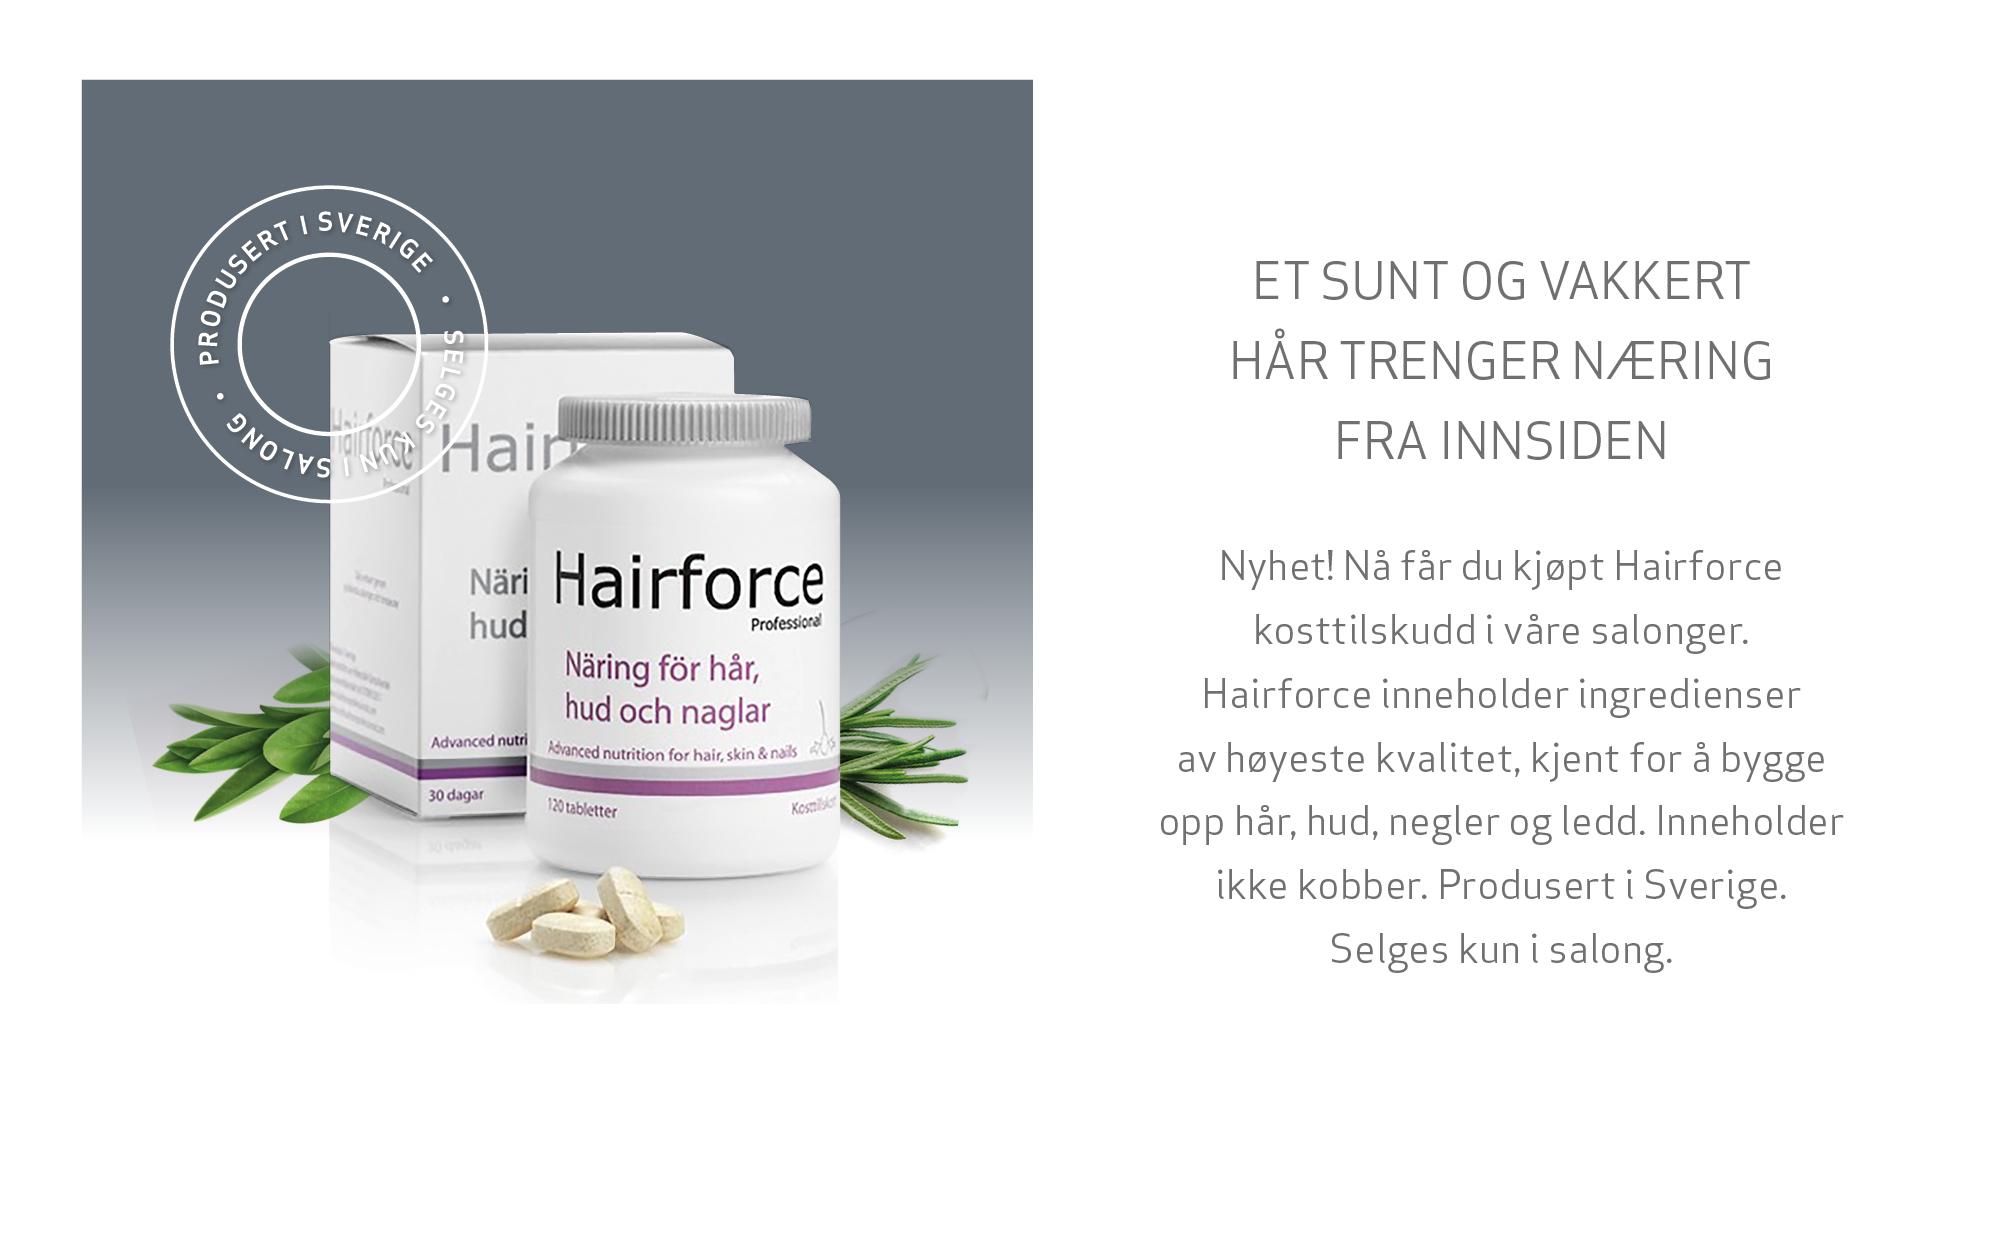 Hairforce kosttilskudd